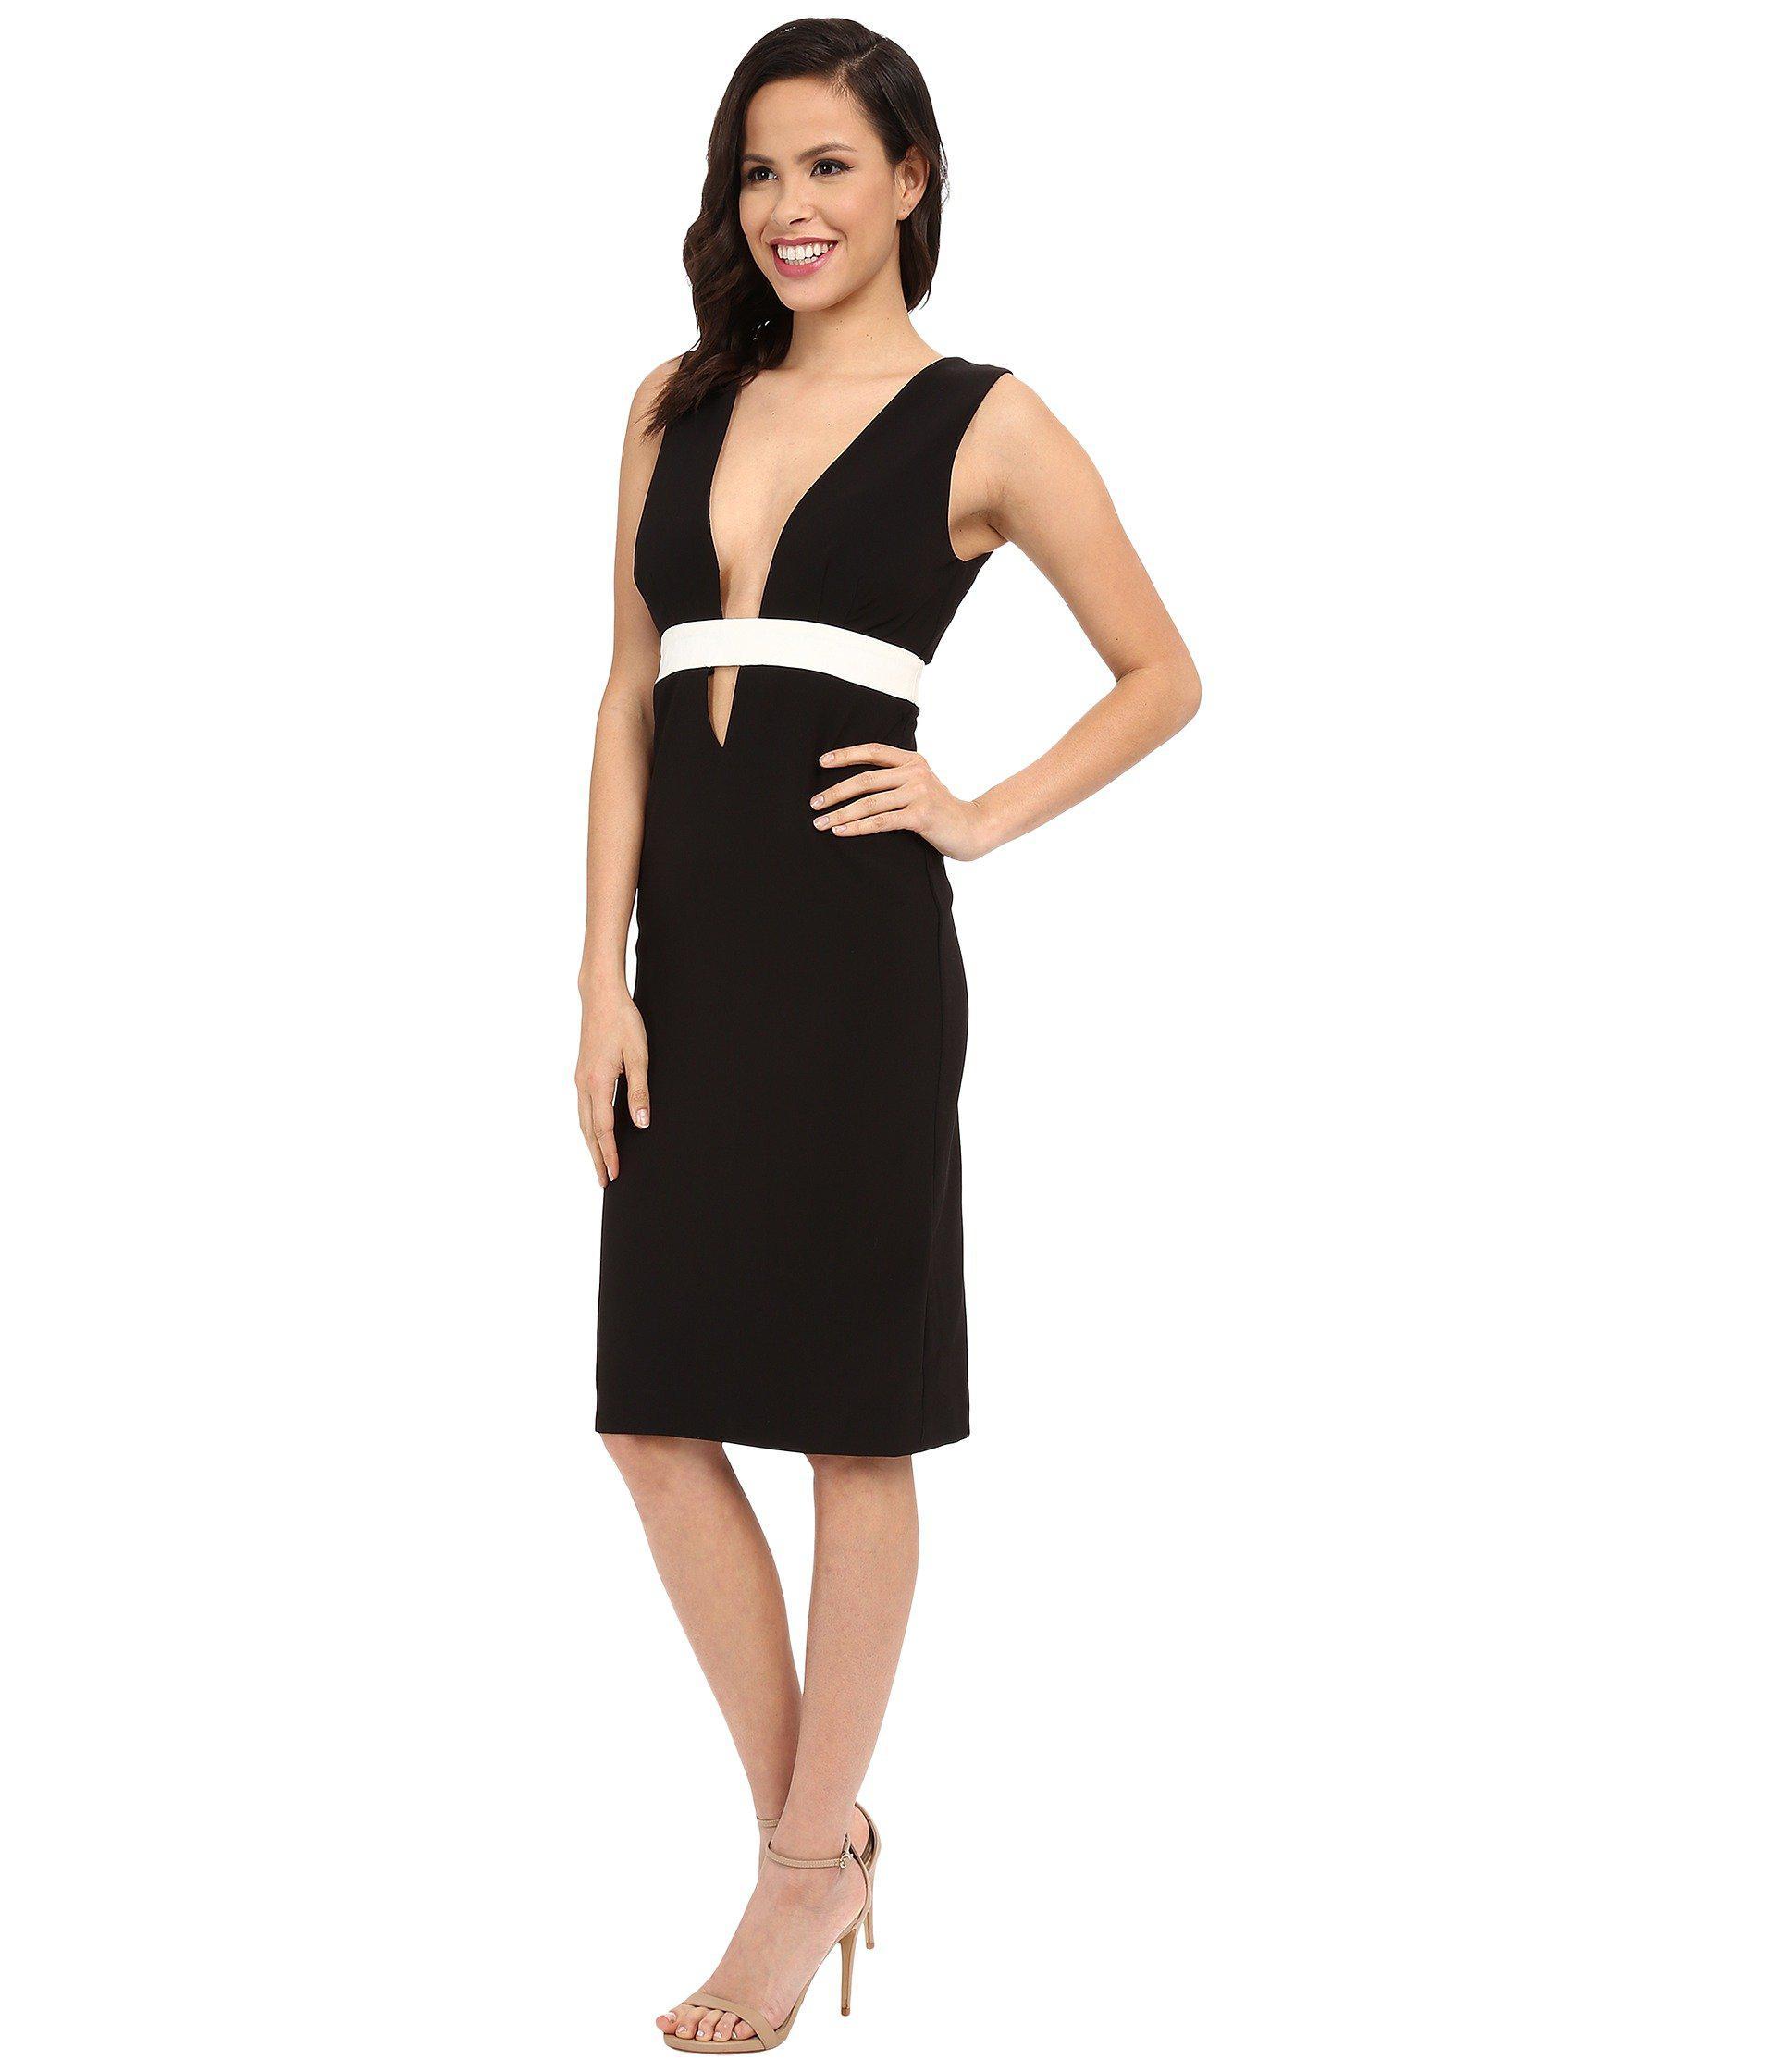 5f363275e5a Lyst - Nicole Miller Viola Color Black Cocktail Dress in Black - Save 42%